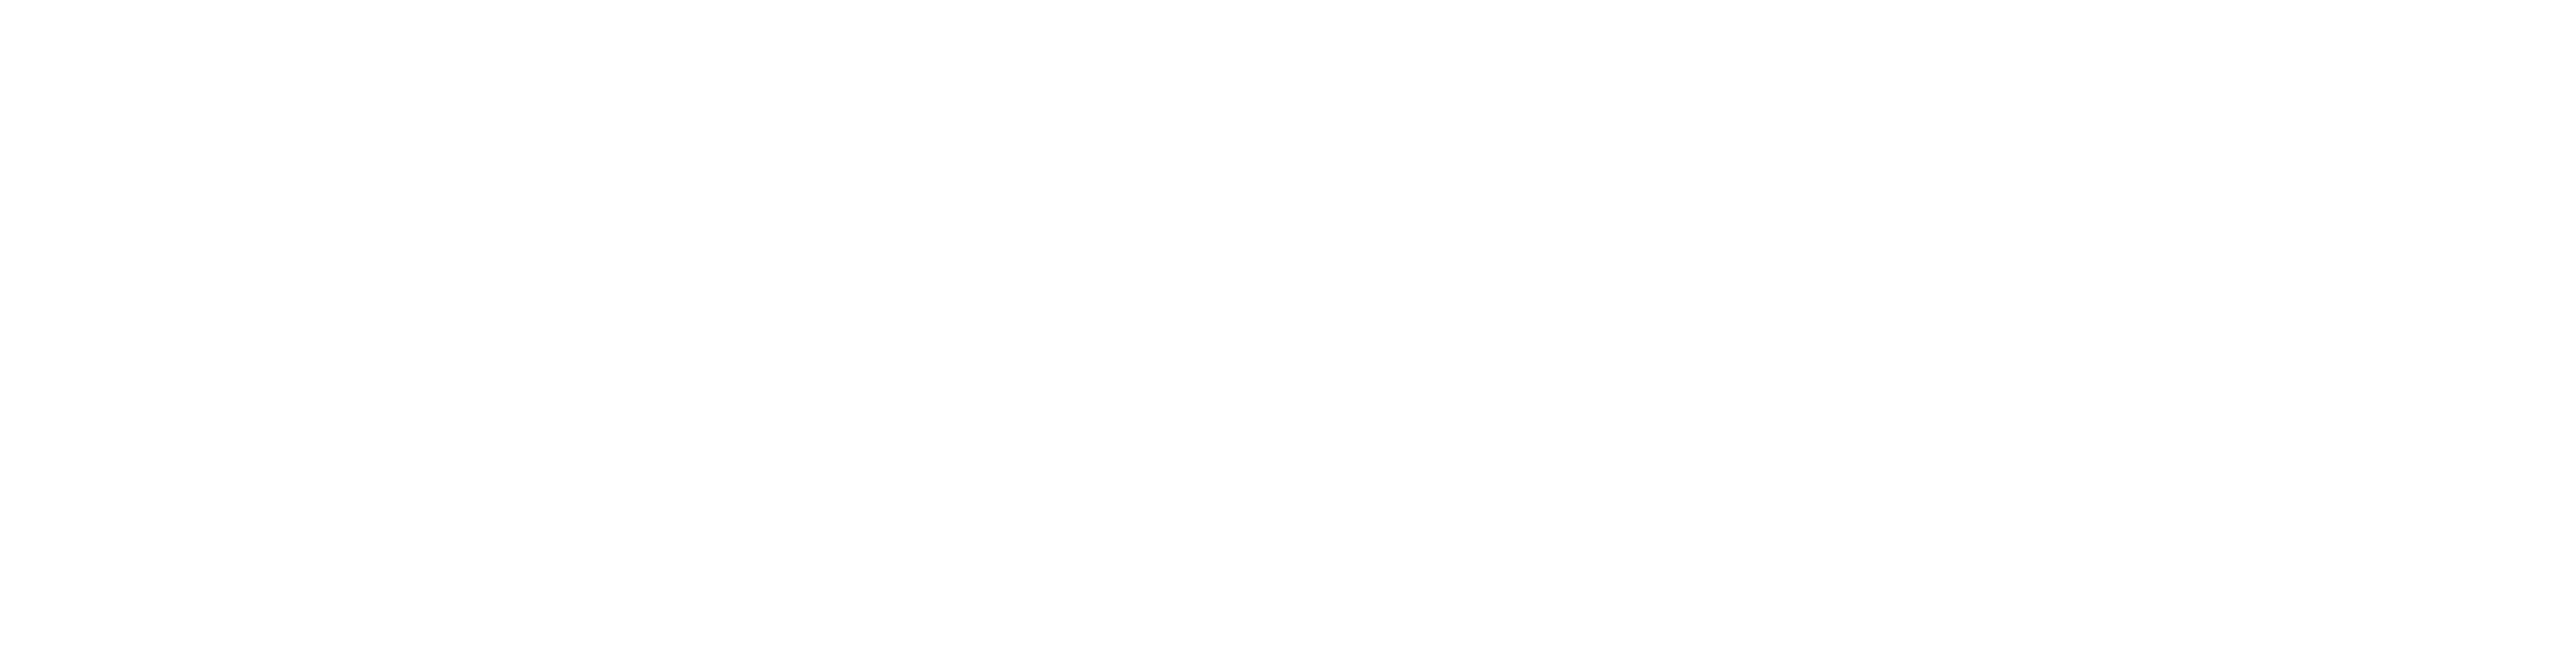 haghefilm-white